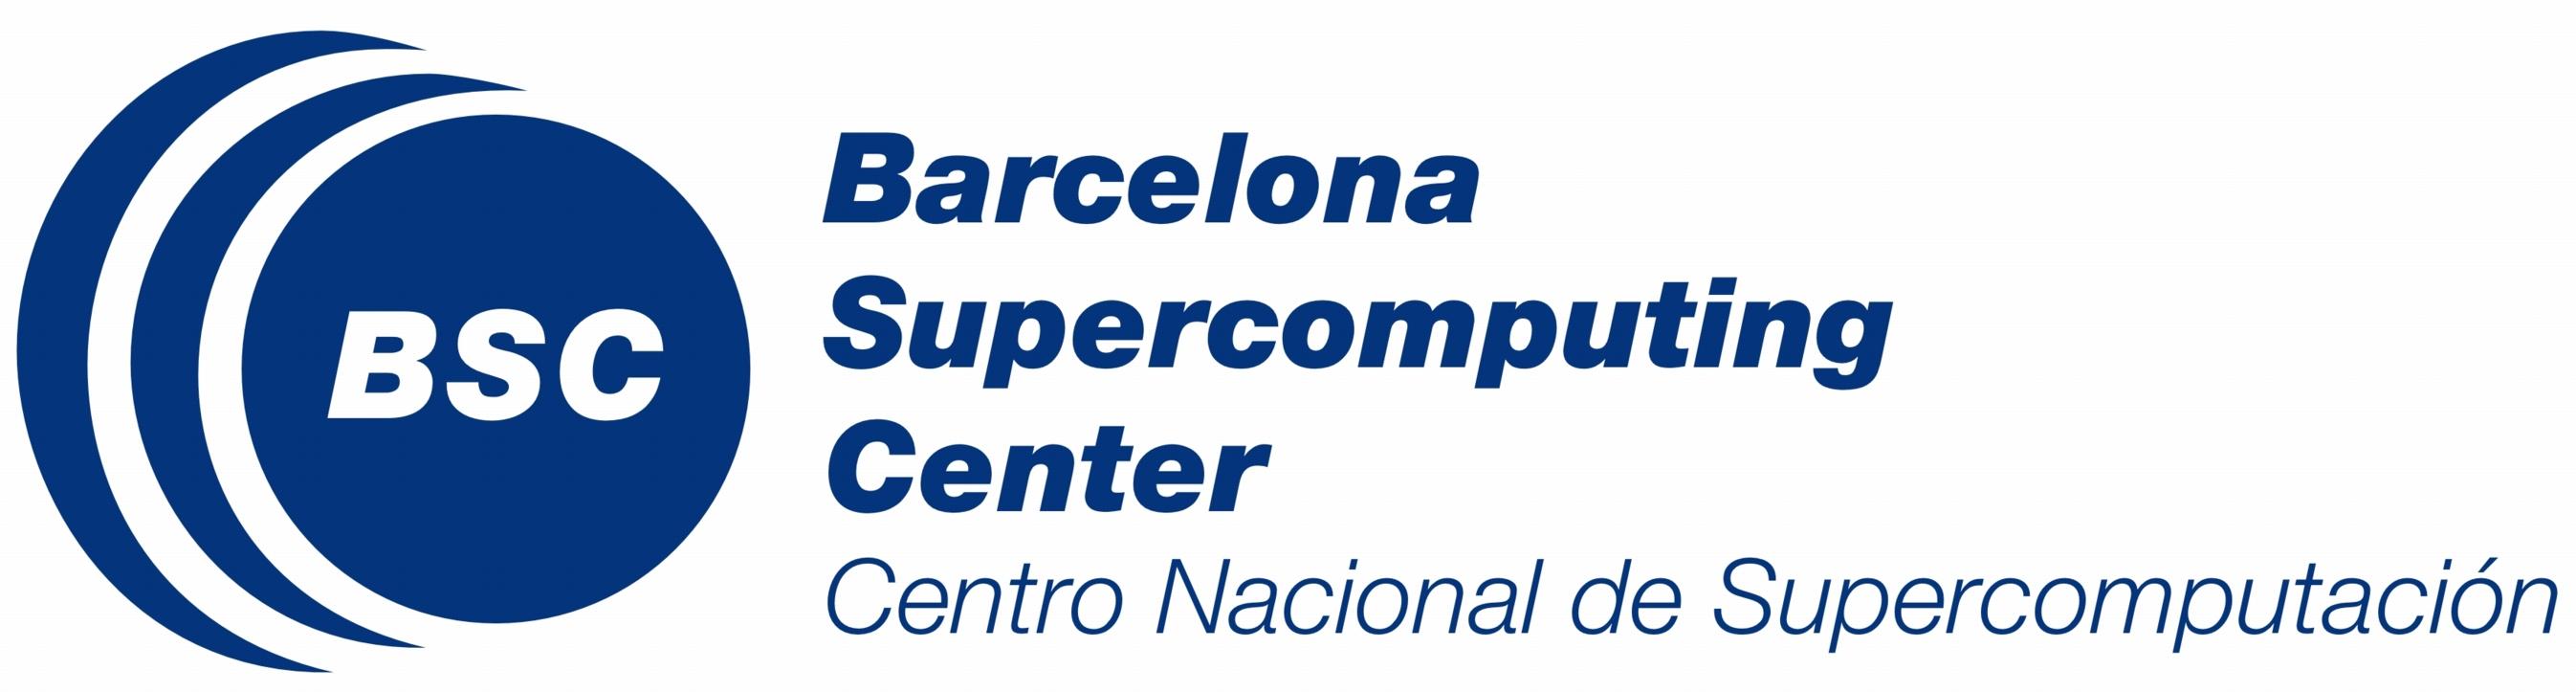 Logo Barcelona Supercomputing Center